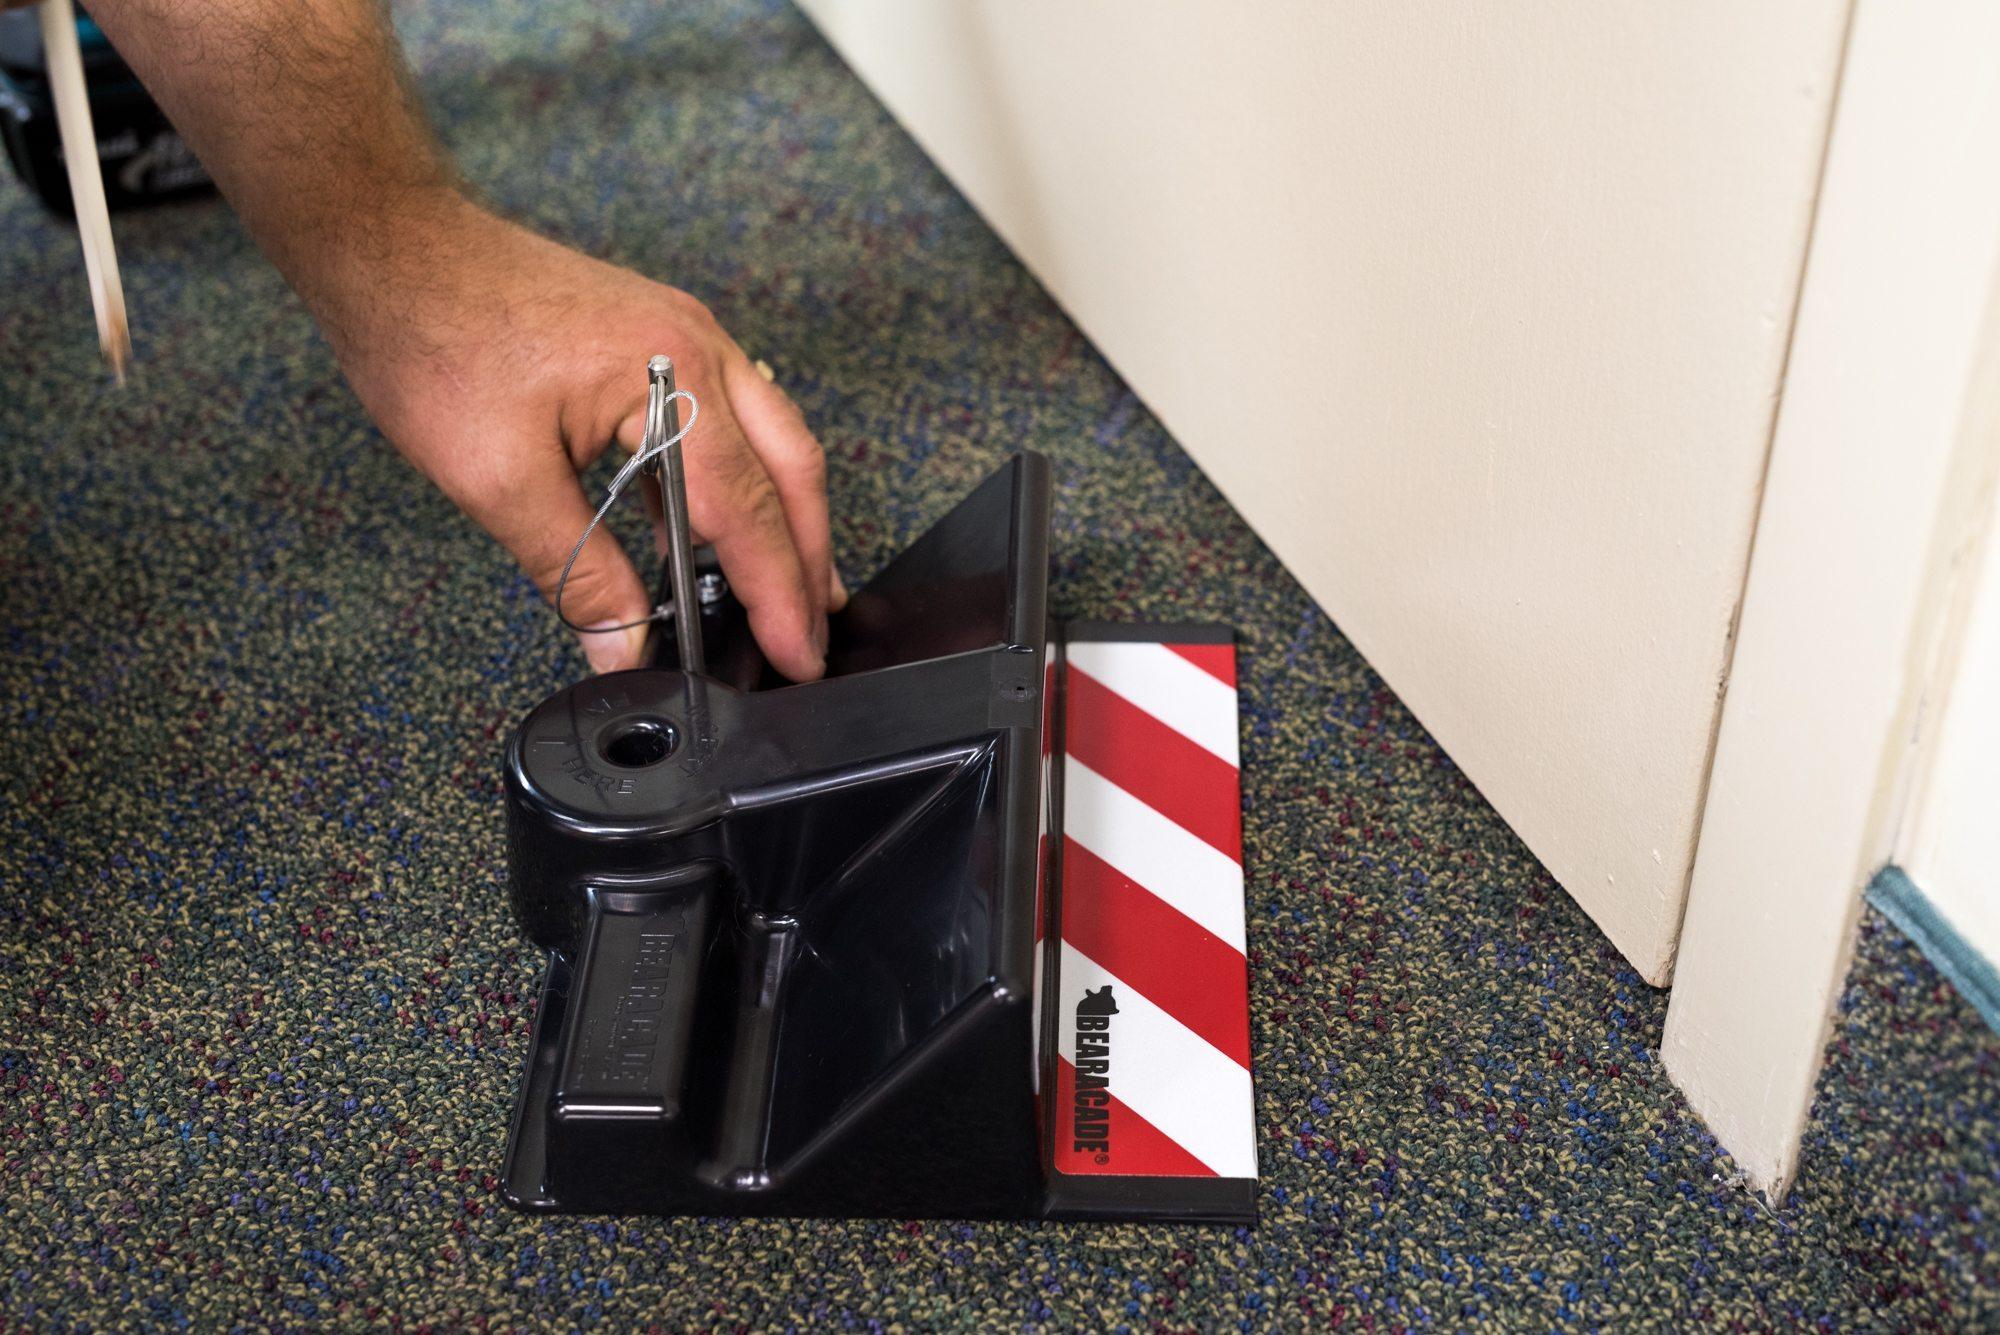 B2 Lockdown System For Inward Opening Doors Bearacade Lockdown